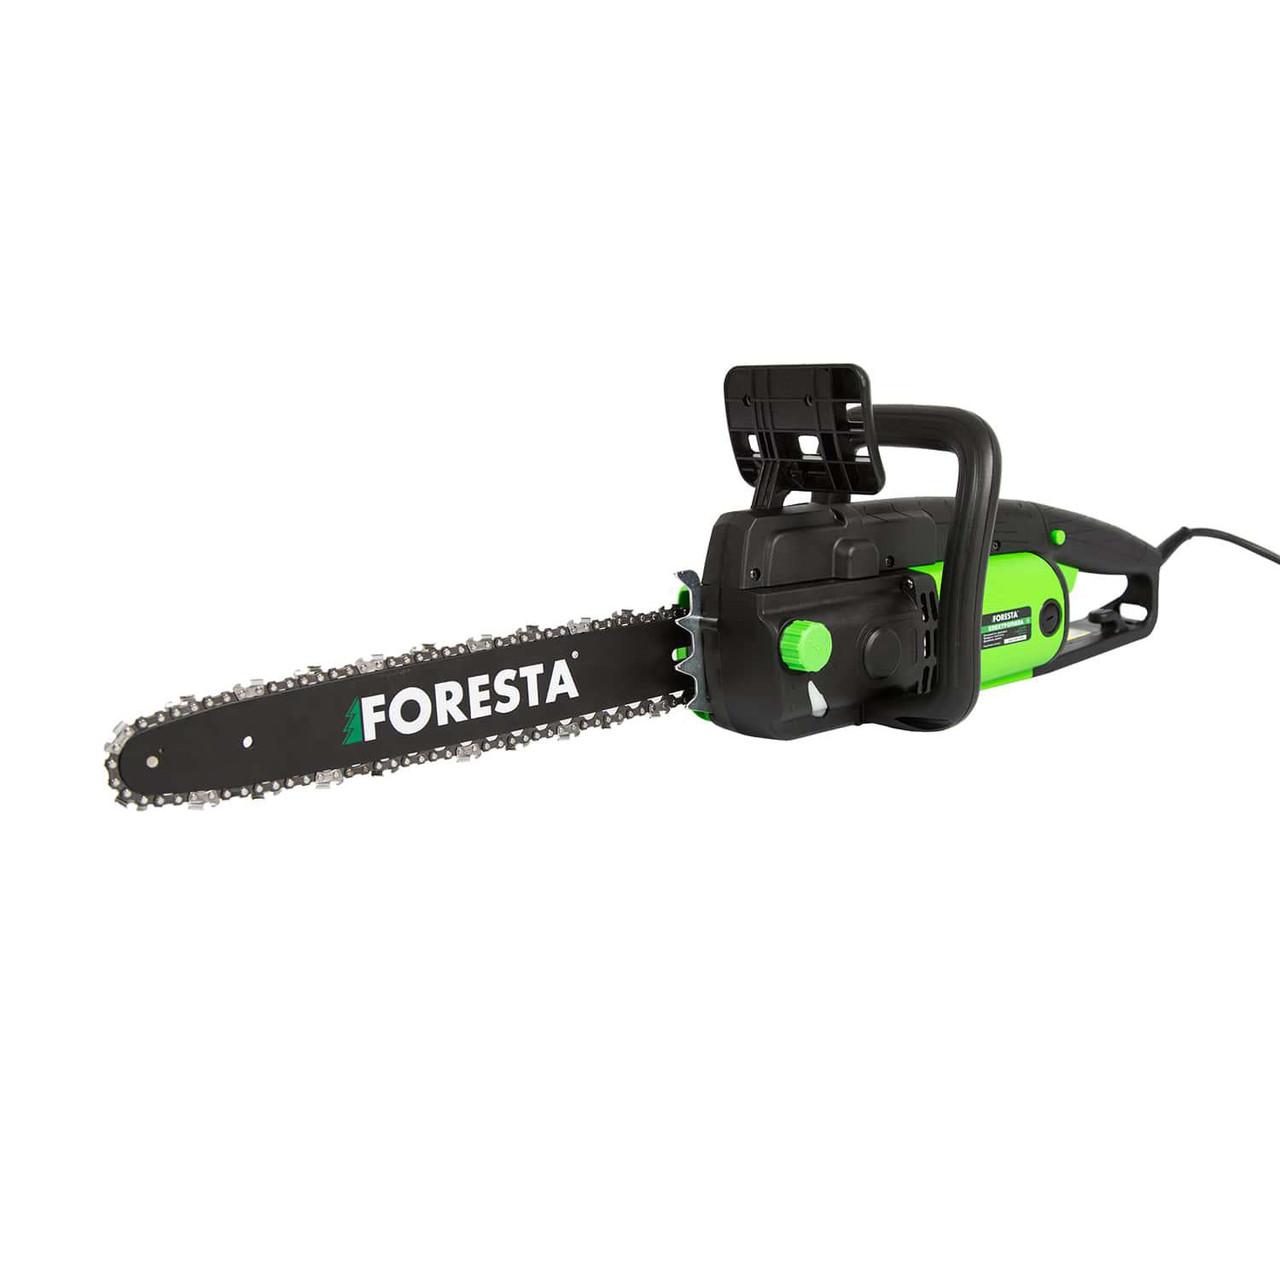 Пила електрична ланцюгова Foresta FS-2440D